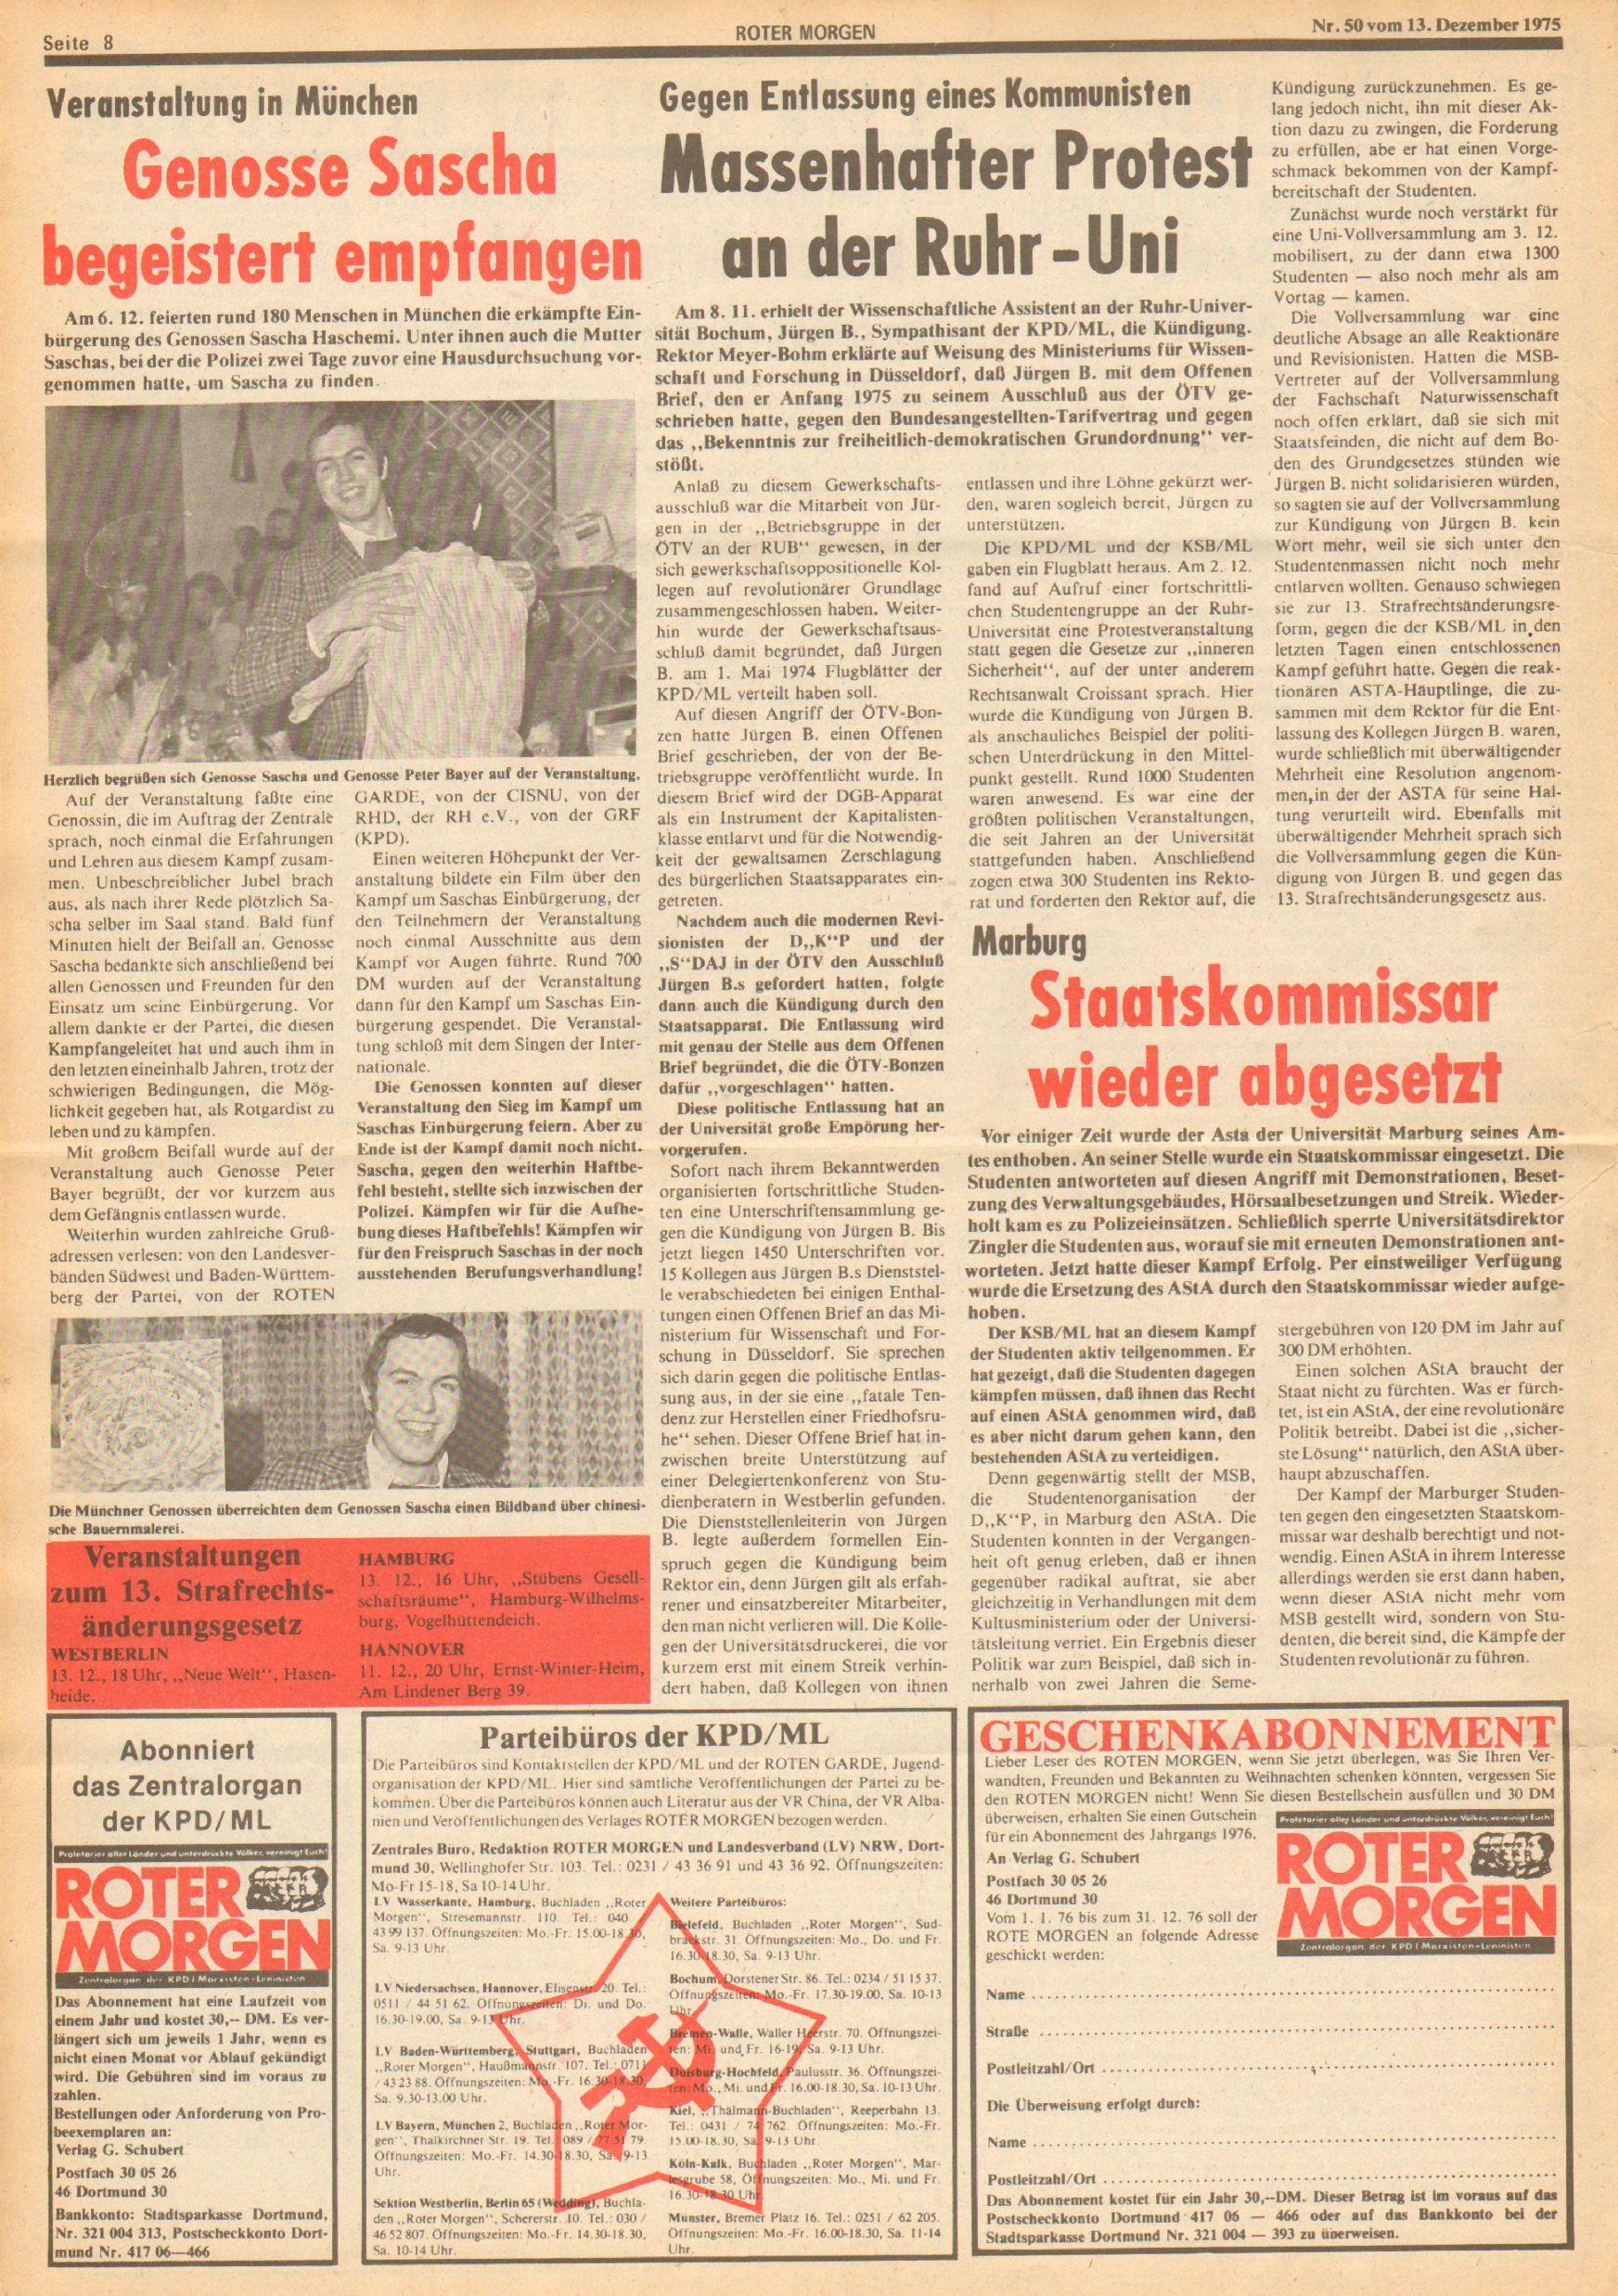 Roter Morgen, 9. Jg., 13. Dezember 1975, Nr. 50, Seite 8